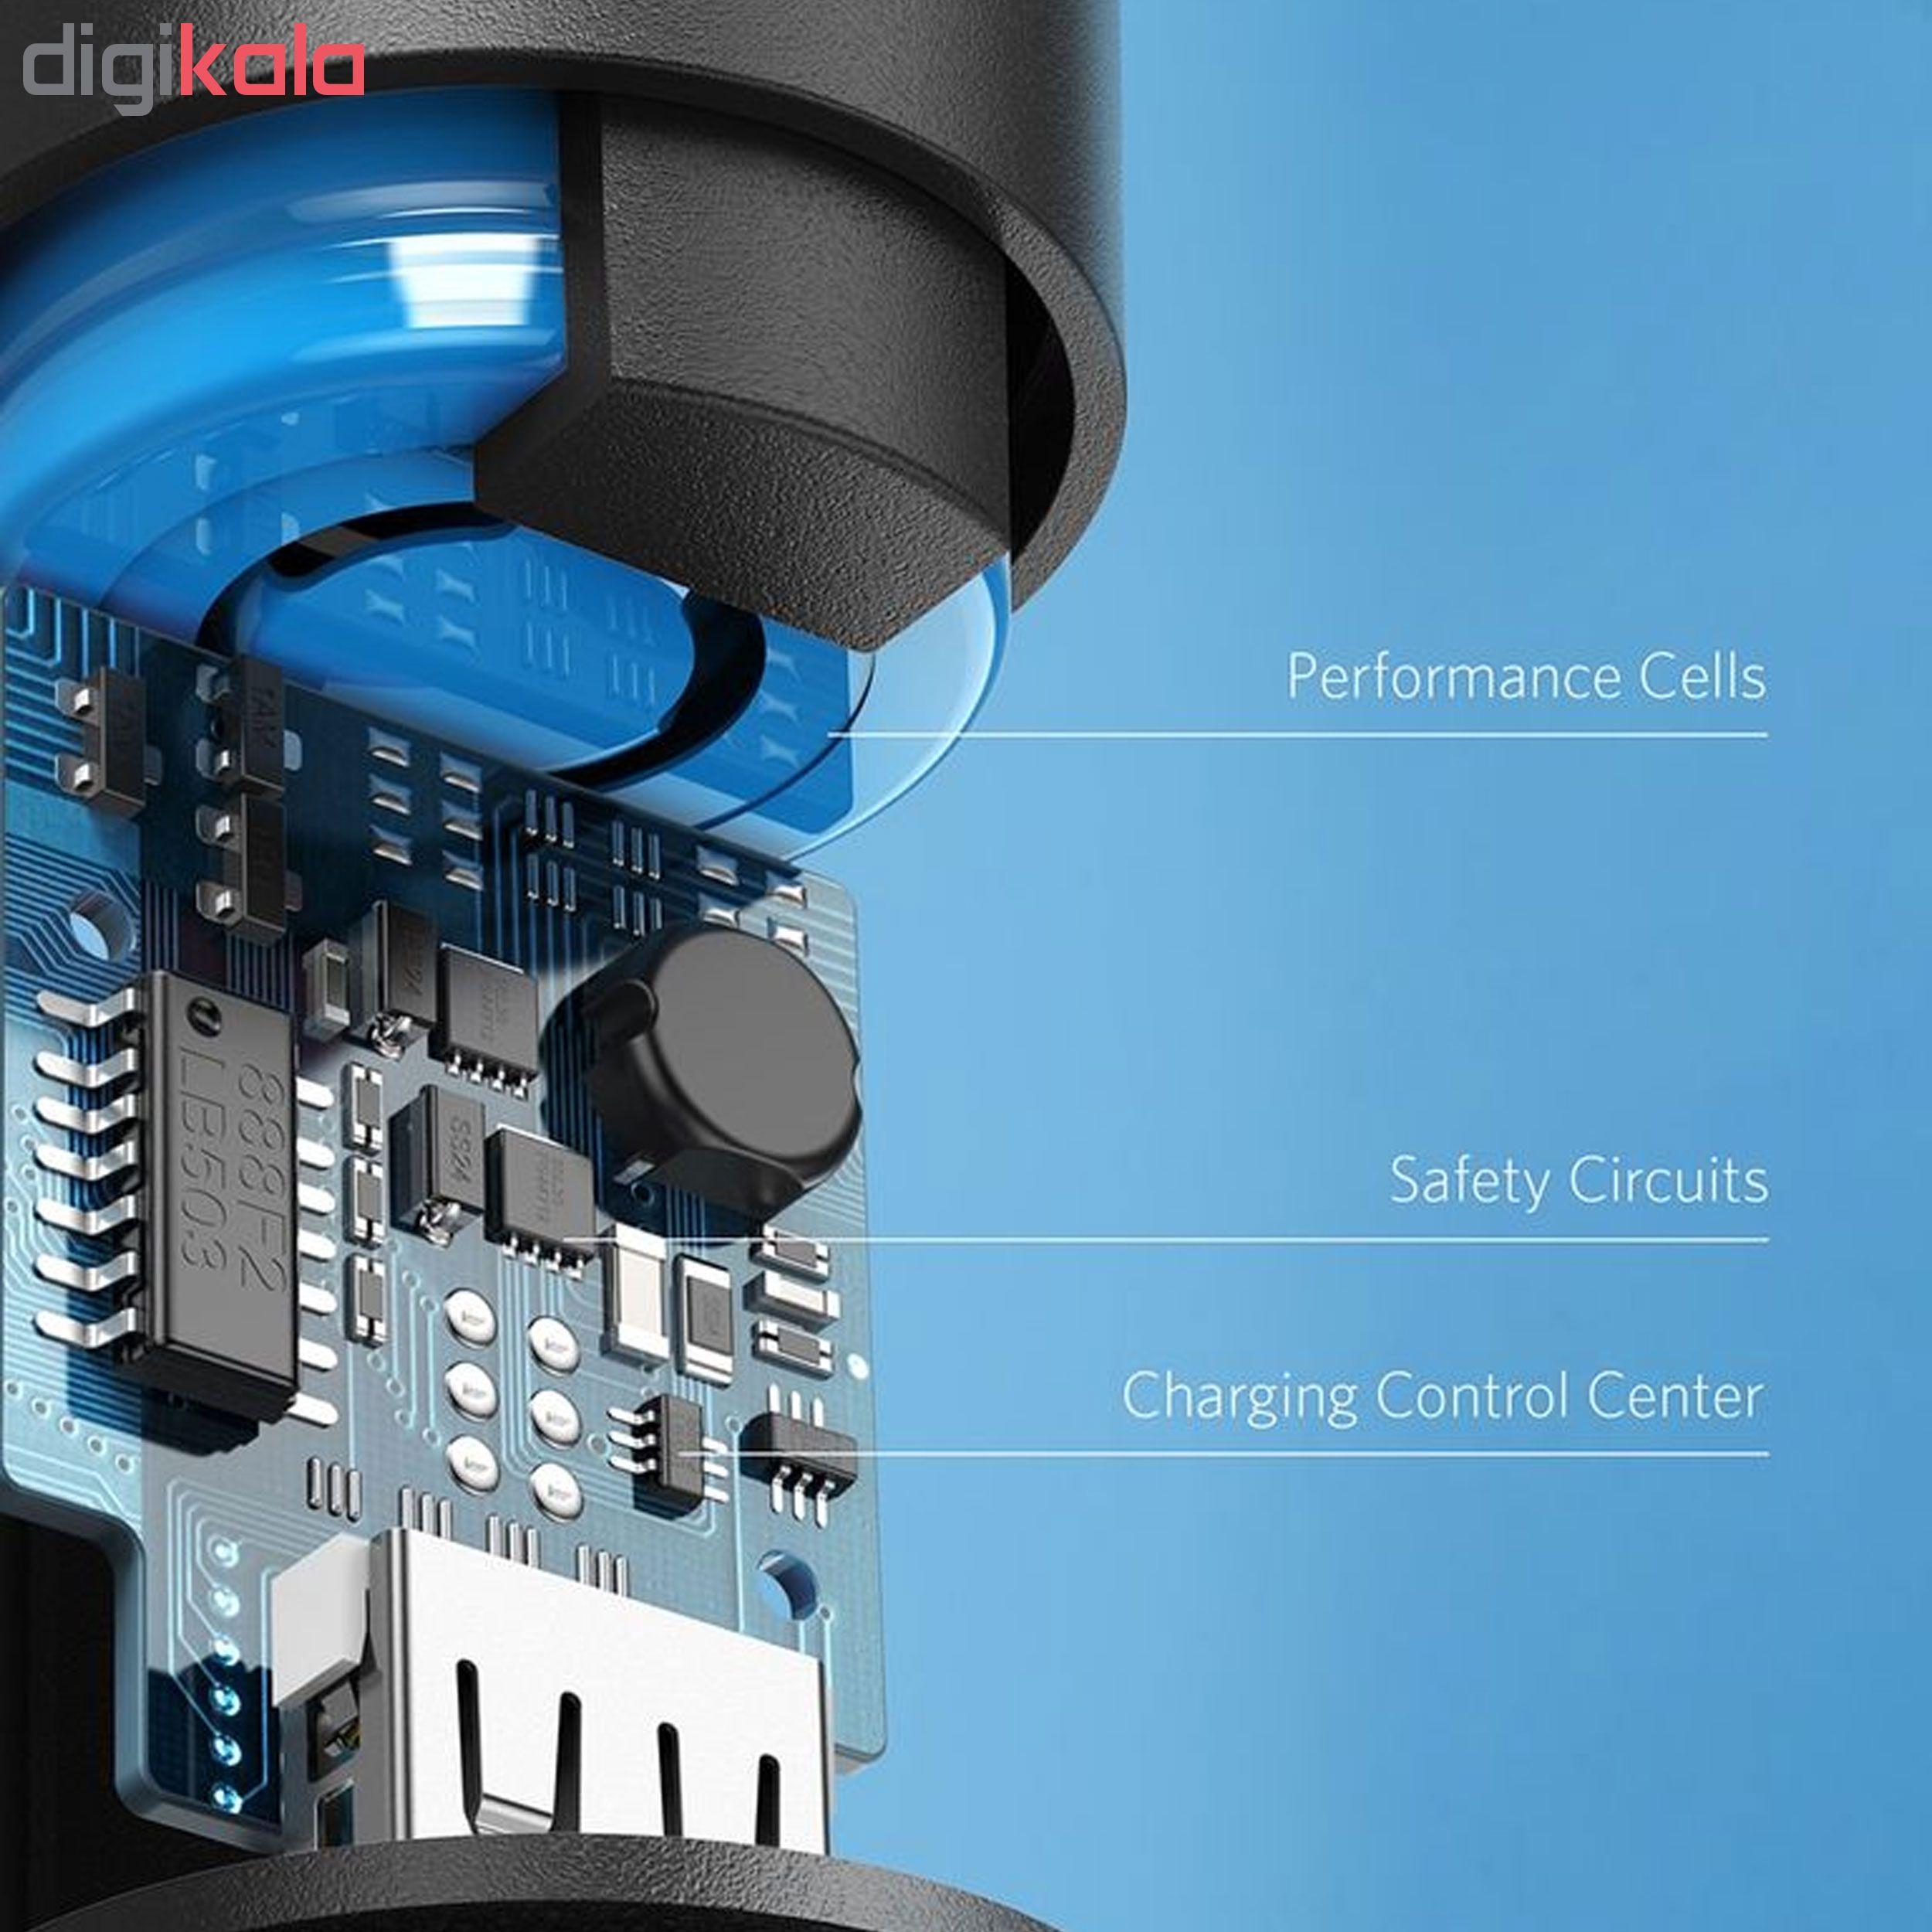 شارژر همراه انکر مدل A1109 PowerCore با ظرفیت 5000 میلی آمپر ساعت main 1 12